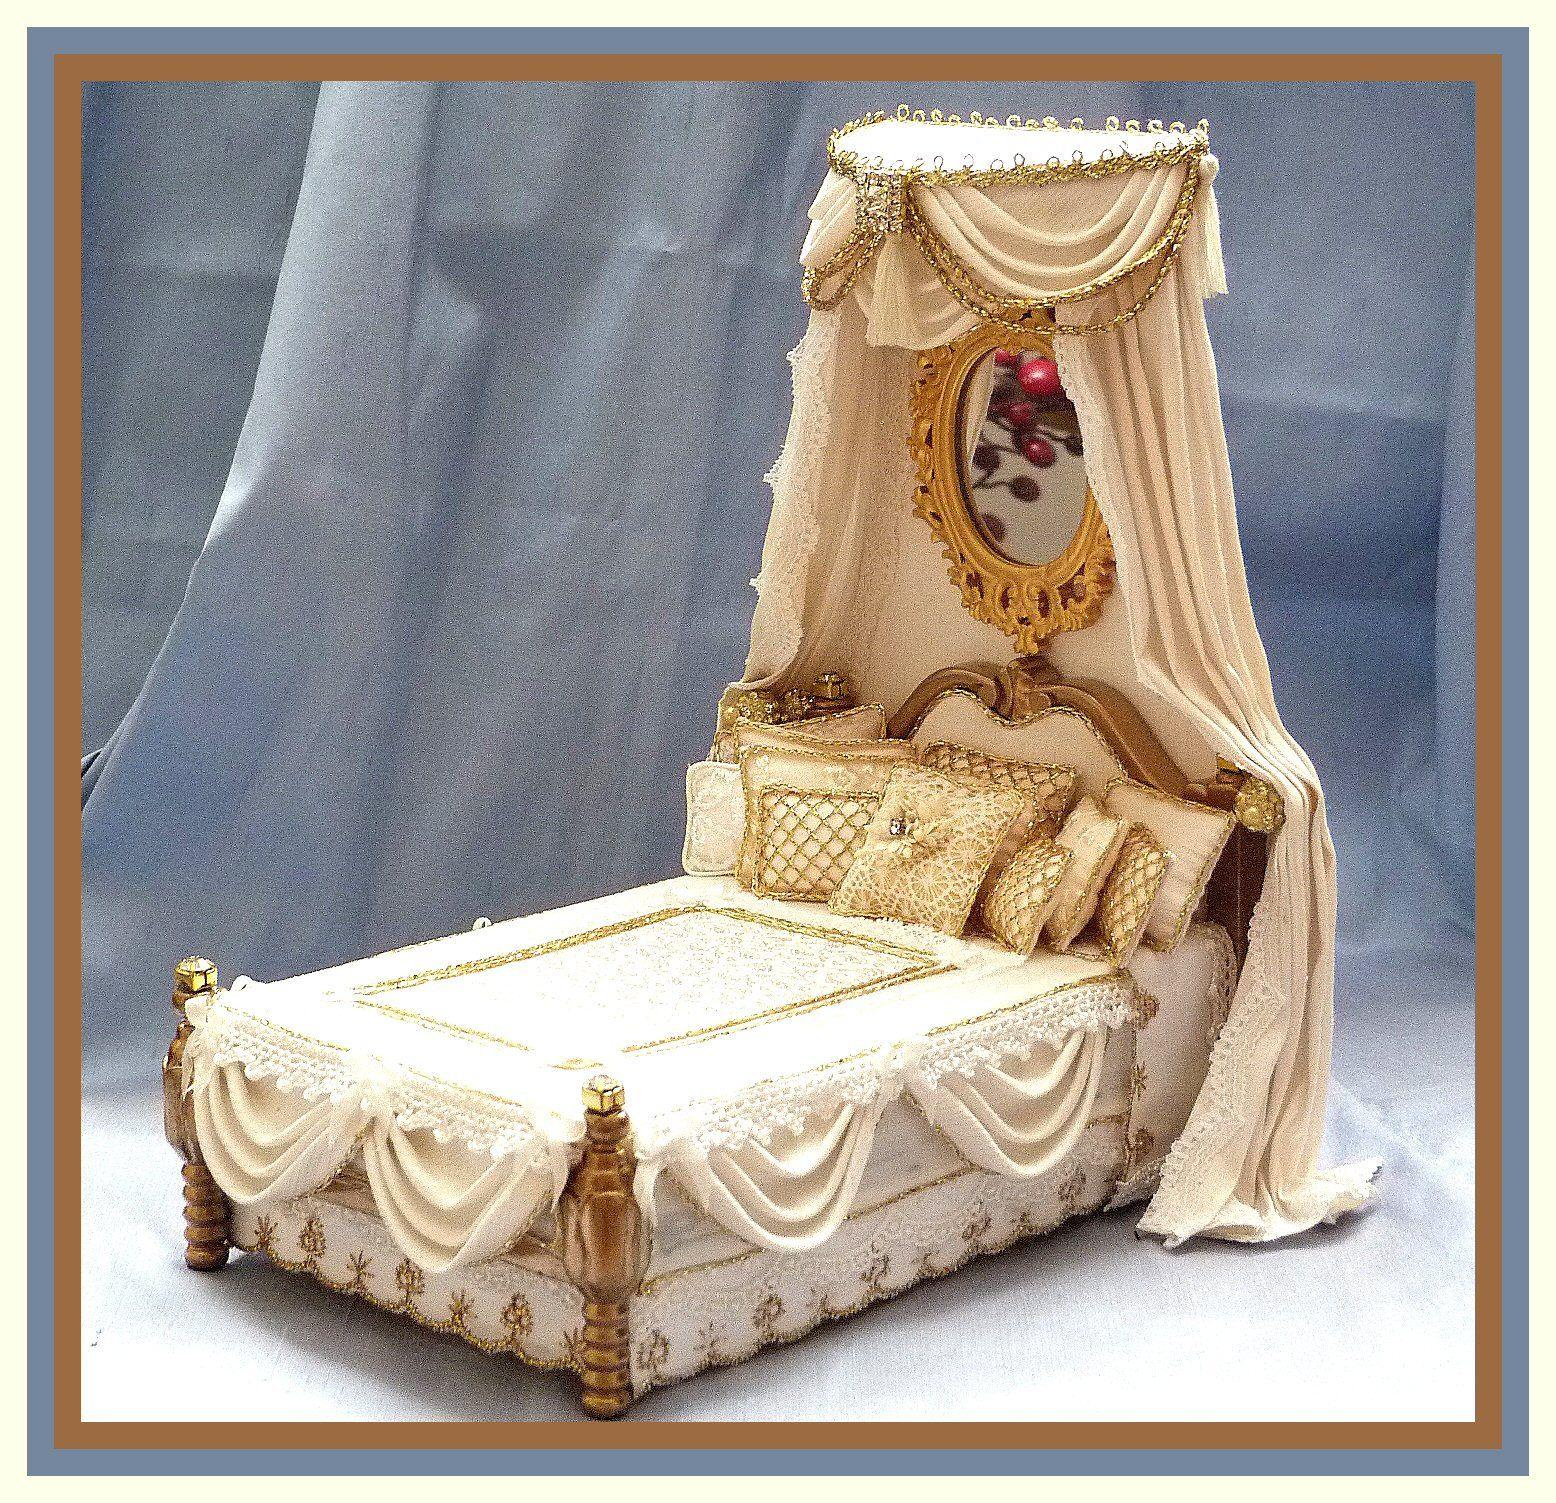 1/12 scale Miniature Dollhouse Silk Canopy Bed & 1/12 scale Miniature Dollhouse Silk Canopy Bed | tiny exquisite ...